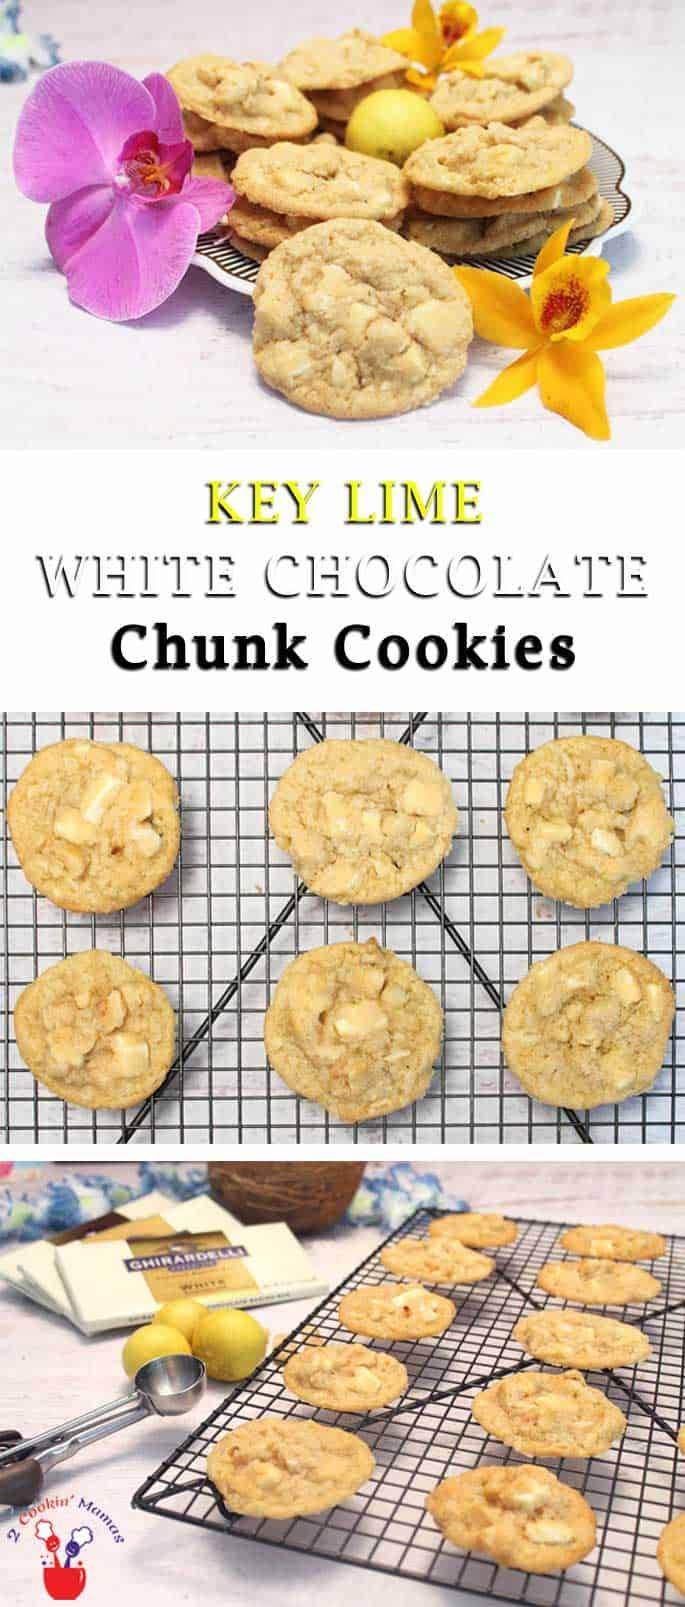 Key lime cookies recipes white chocolate